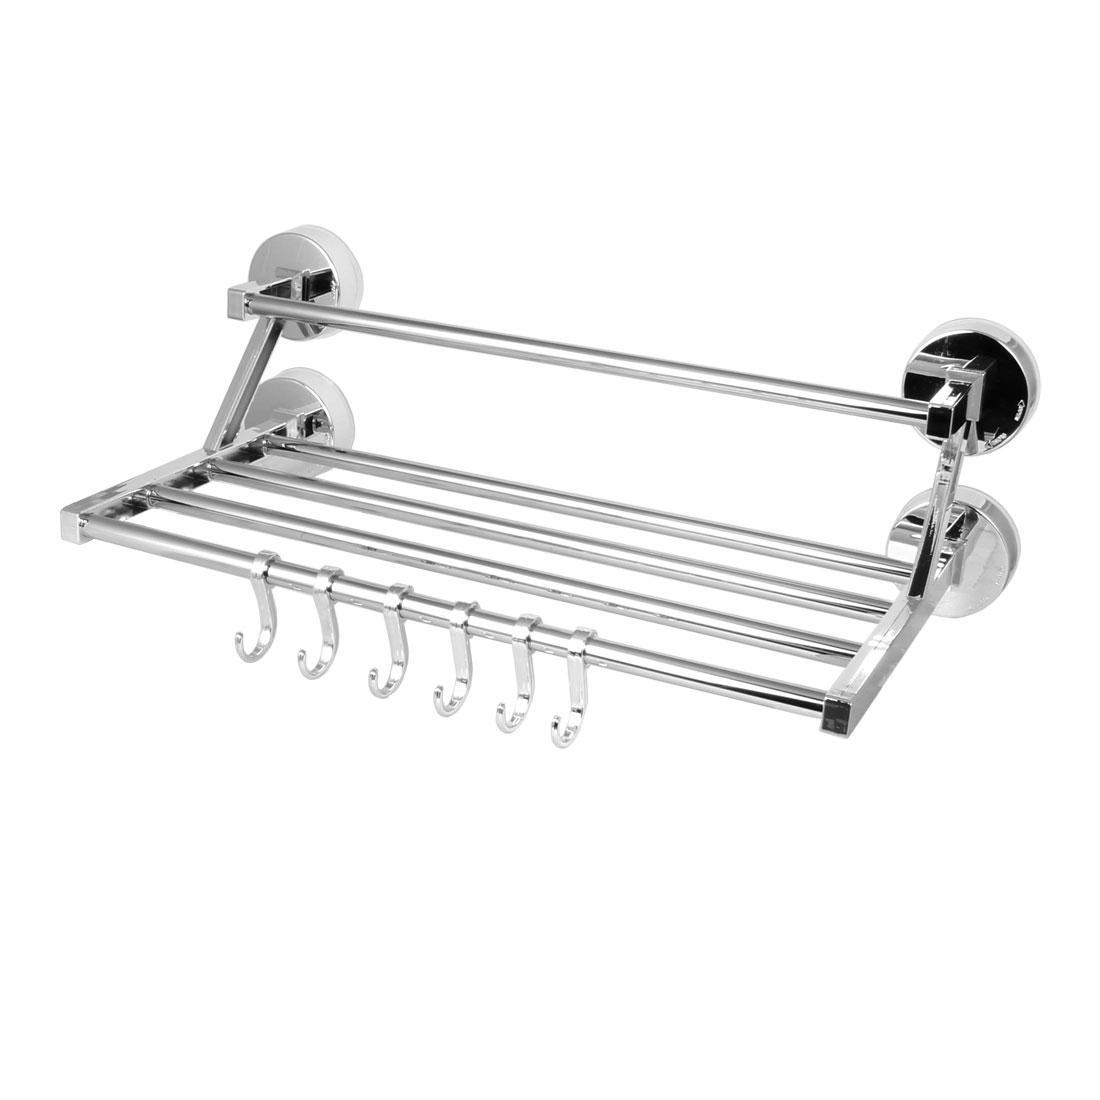 Home Metal Suction Cup Towel Clothes Storage Holder Rack Shelf Set Silver Tone